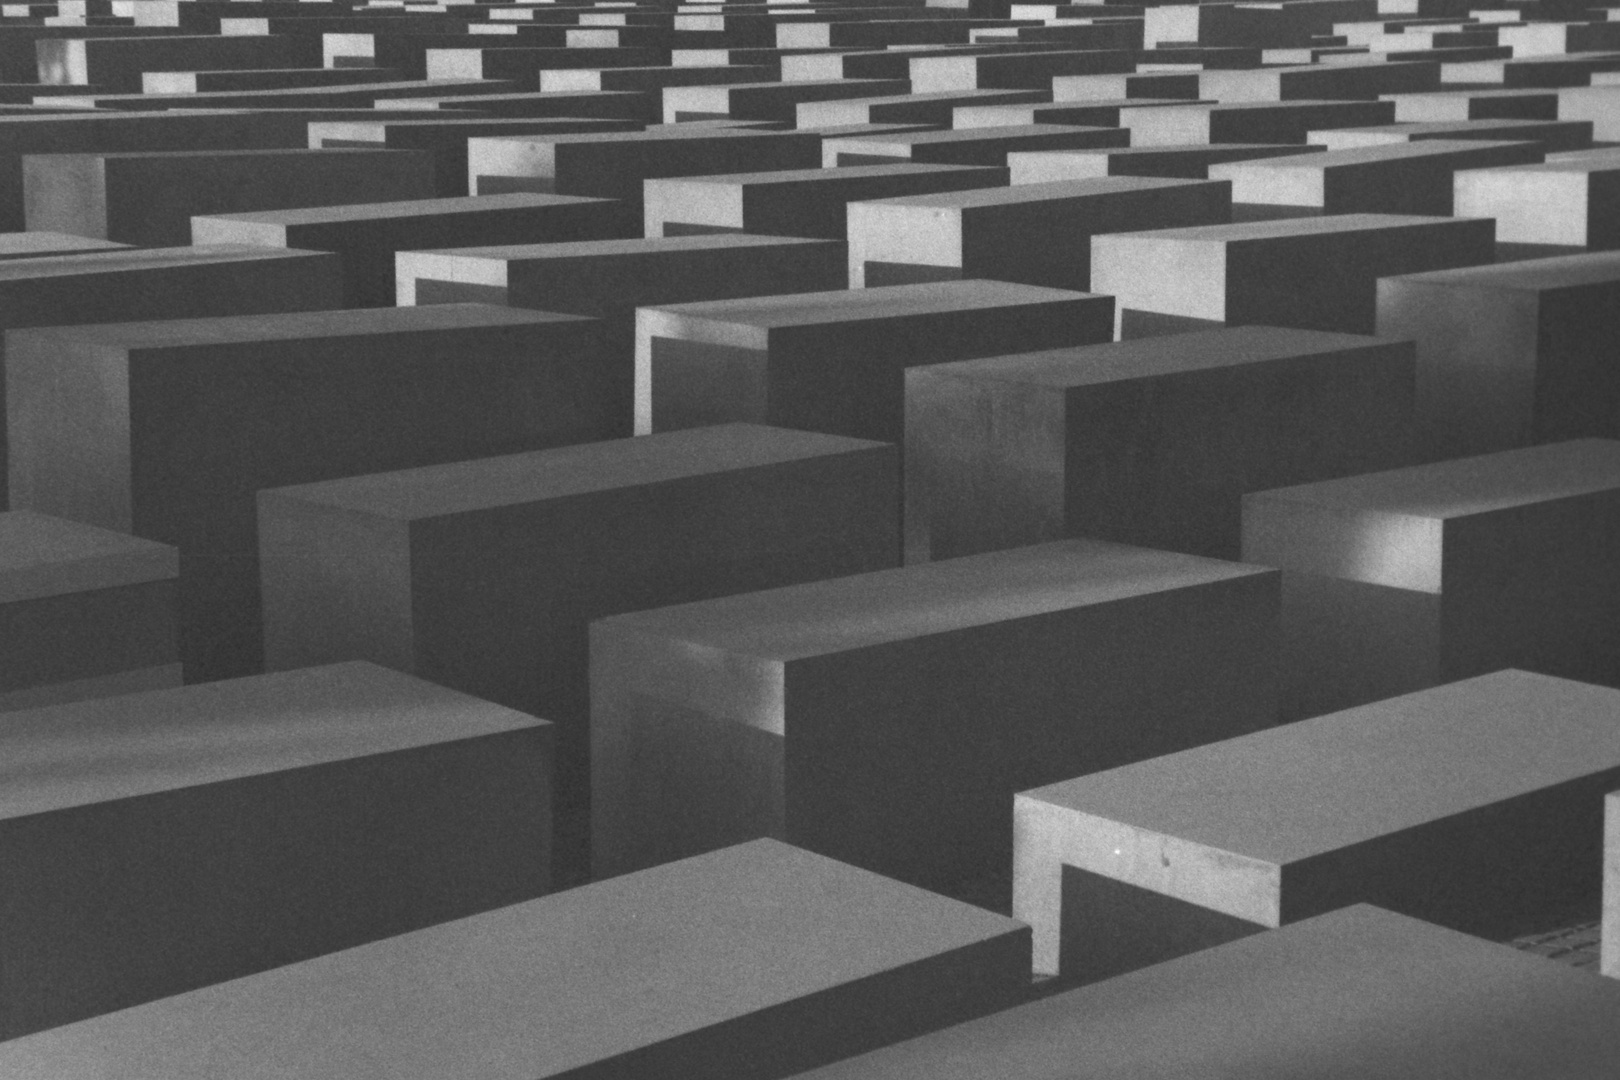 Denkmal für die ermordeten Juden Europas - Holocaust-Mahnmal